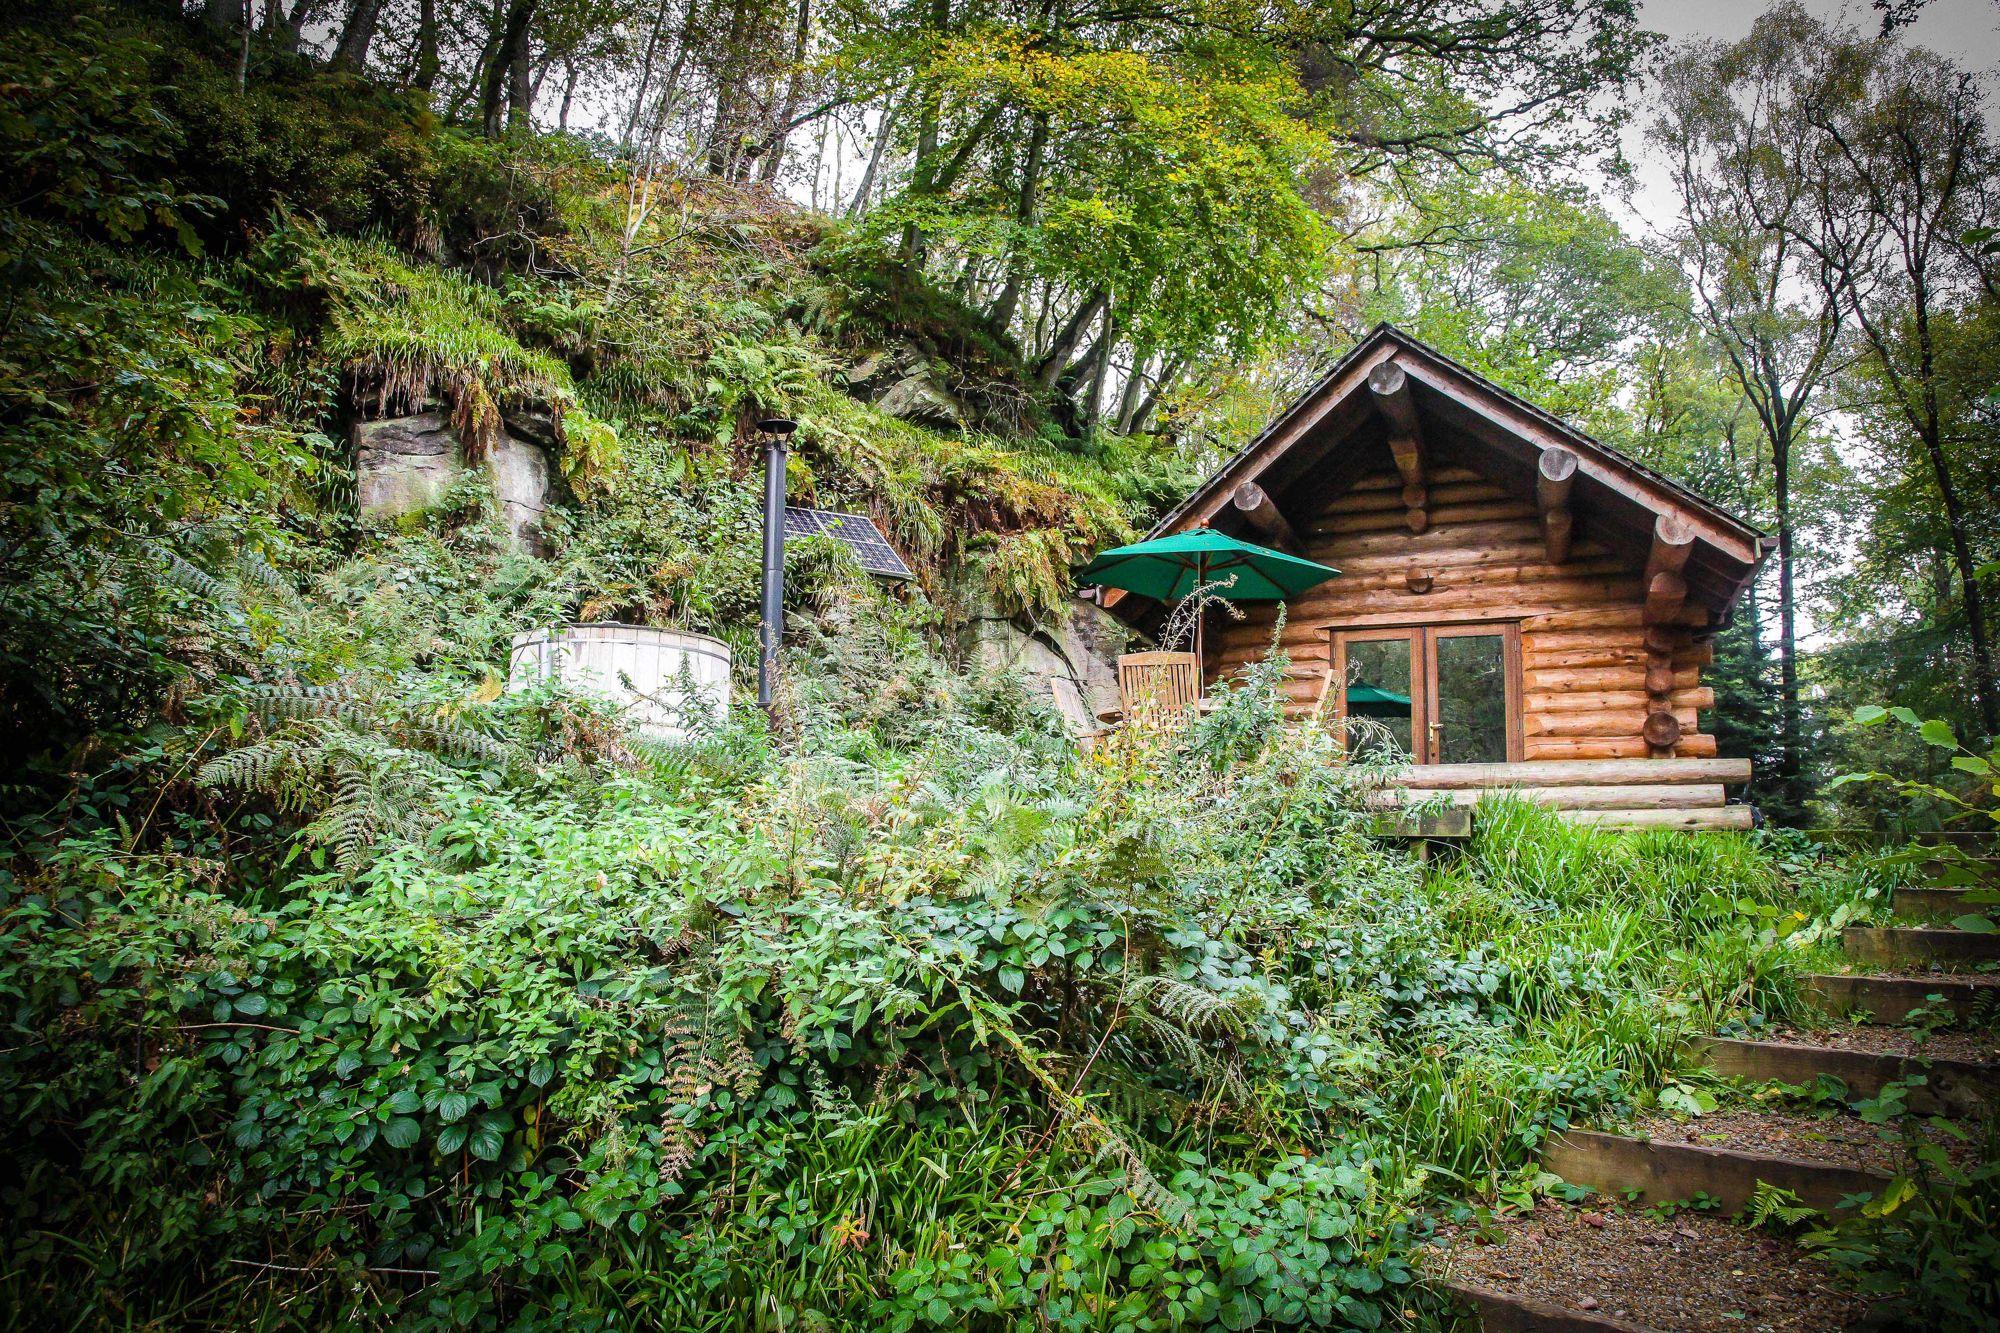 Shank Wood Log Cabin